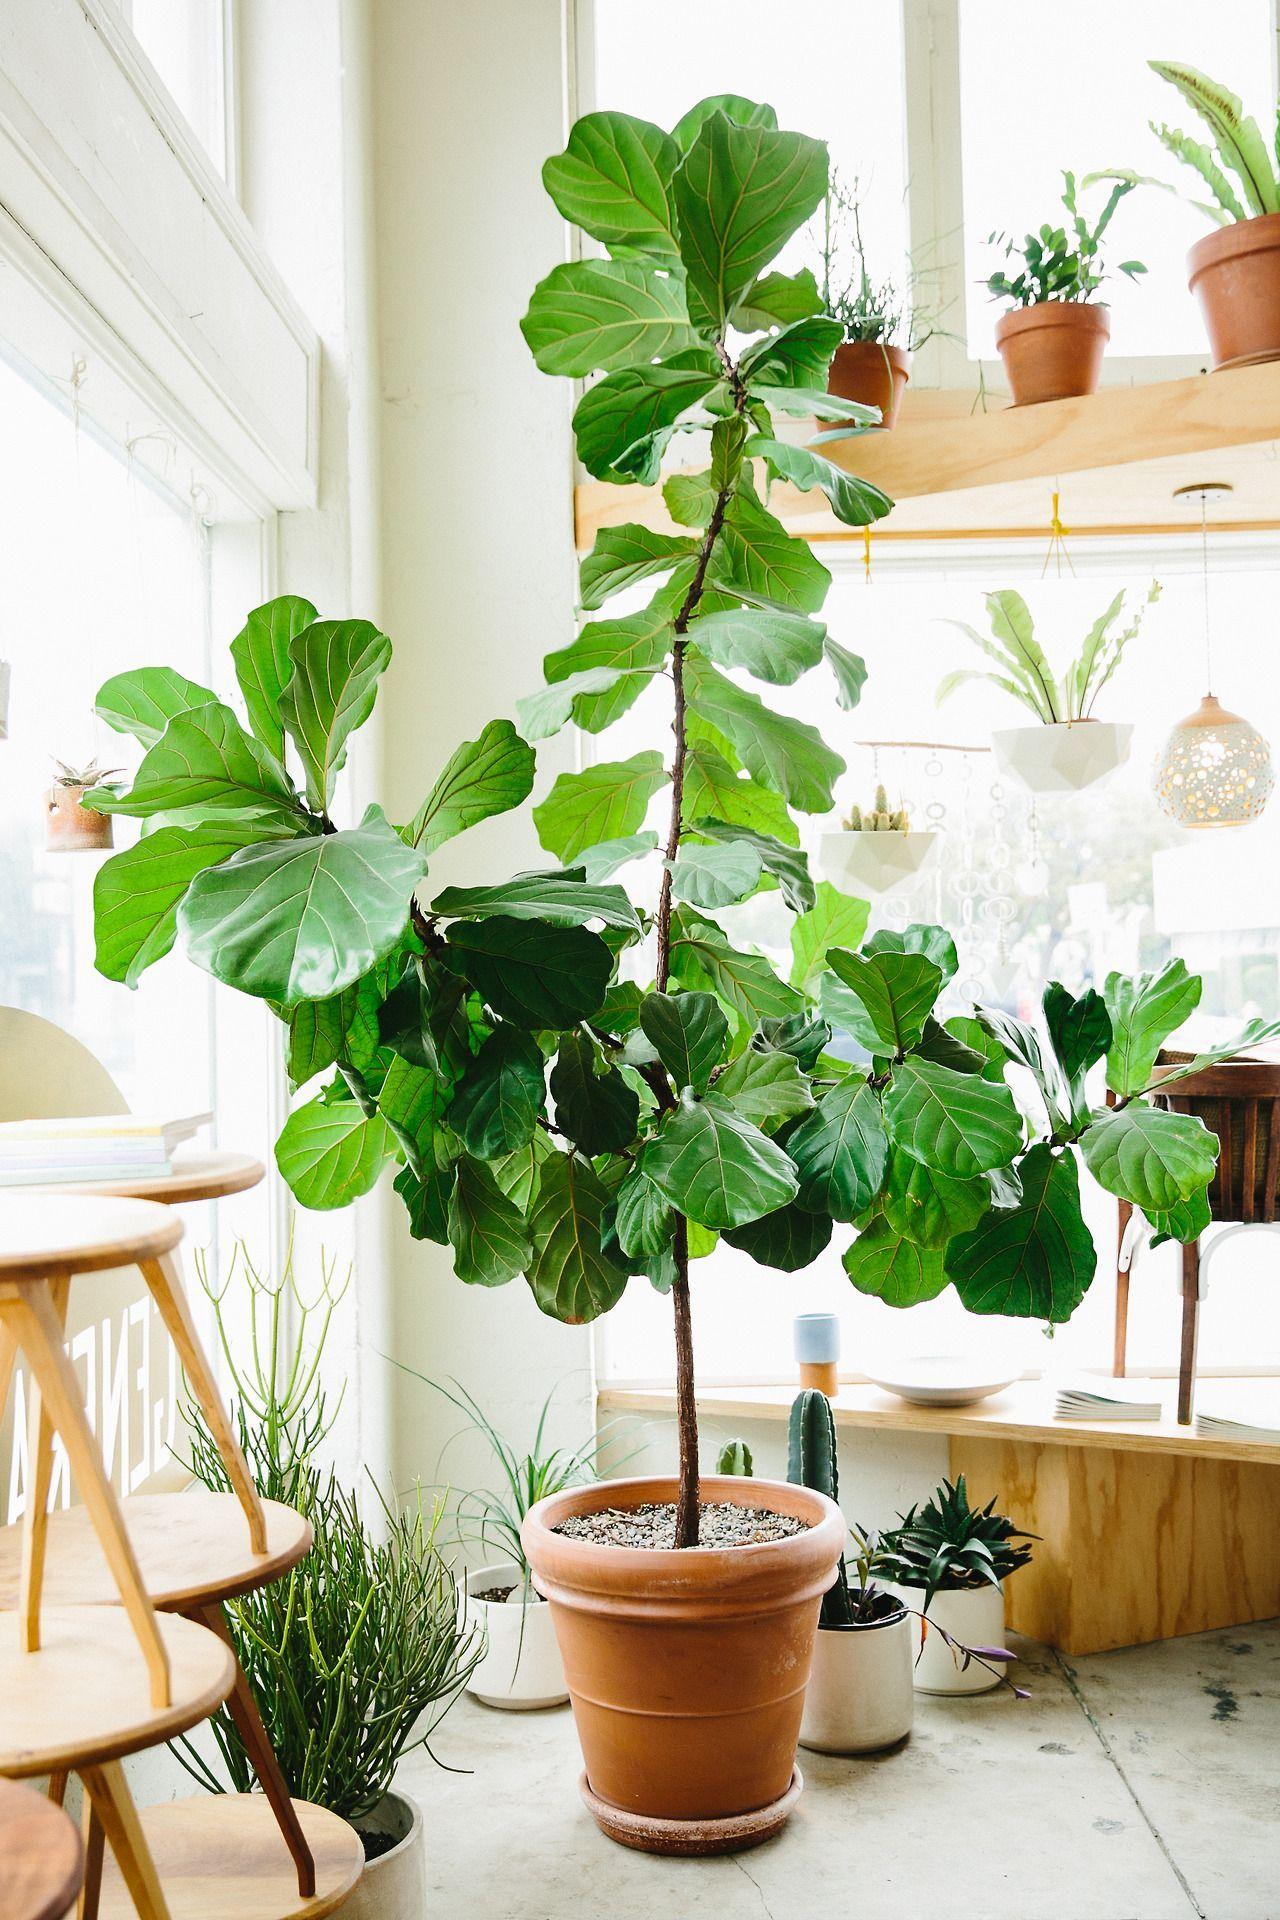 Fiddly fig plant // Fiolfikus Fiddle leaf fig tree